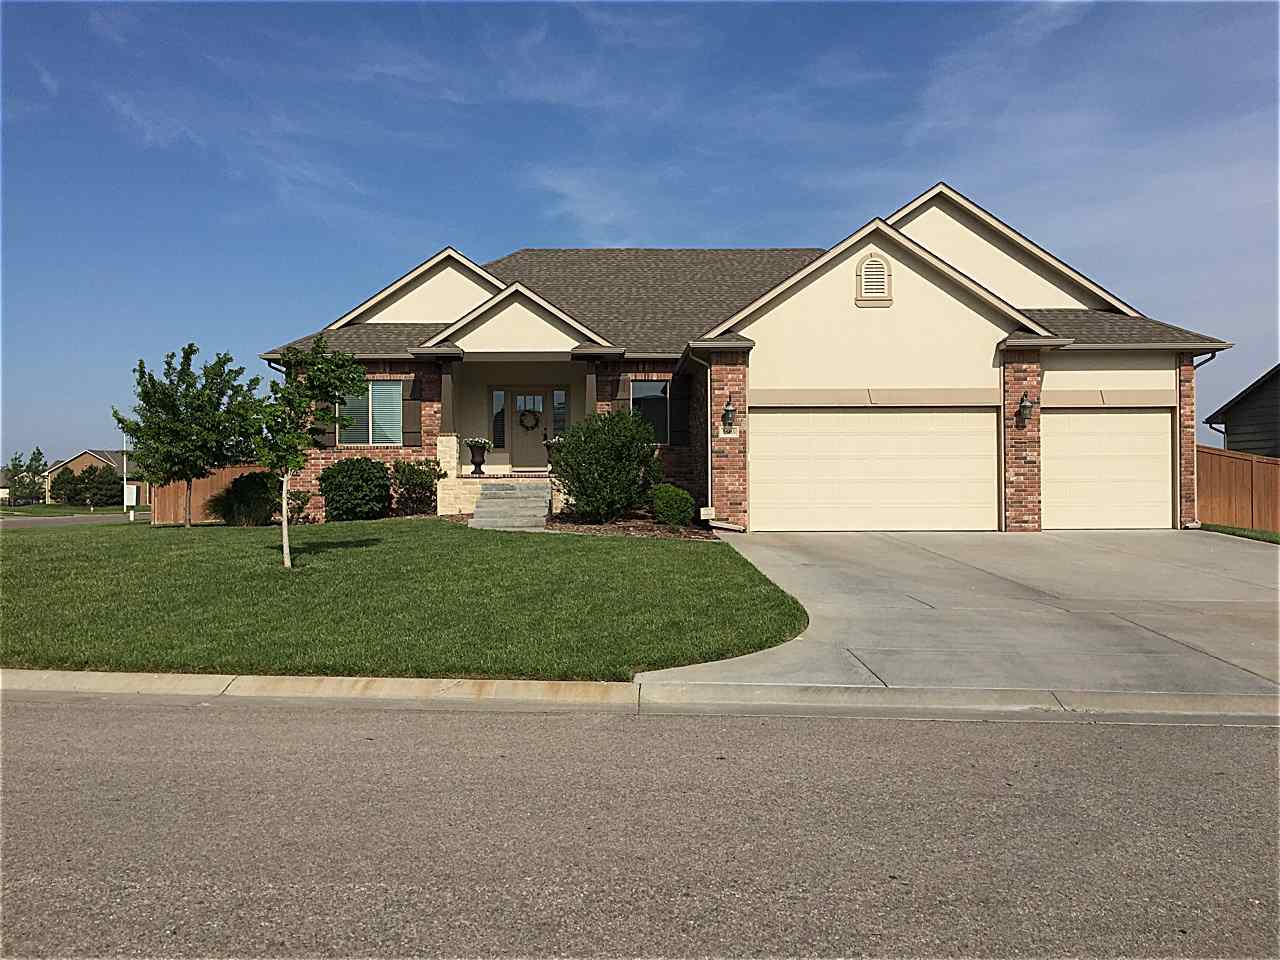 2503 N Flutter Circle, Wichita, KS 67228